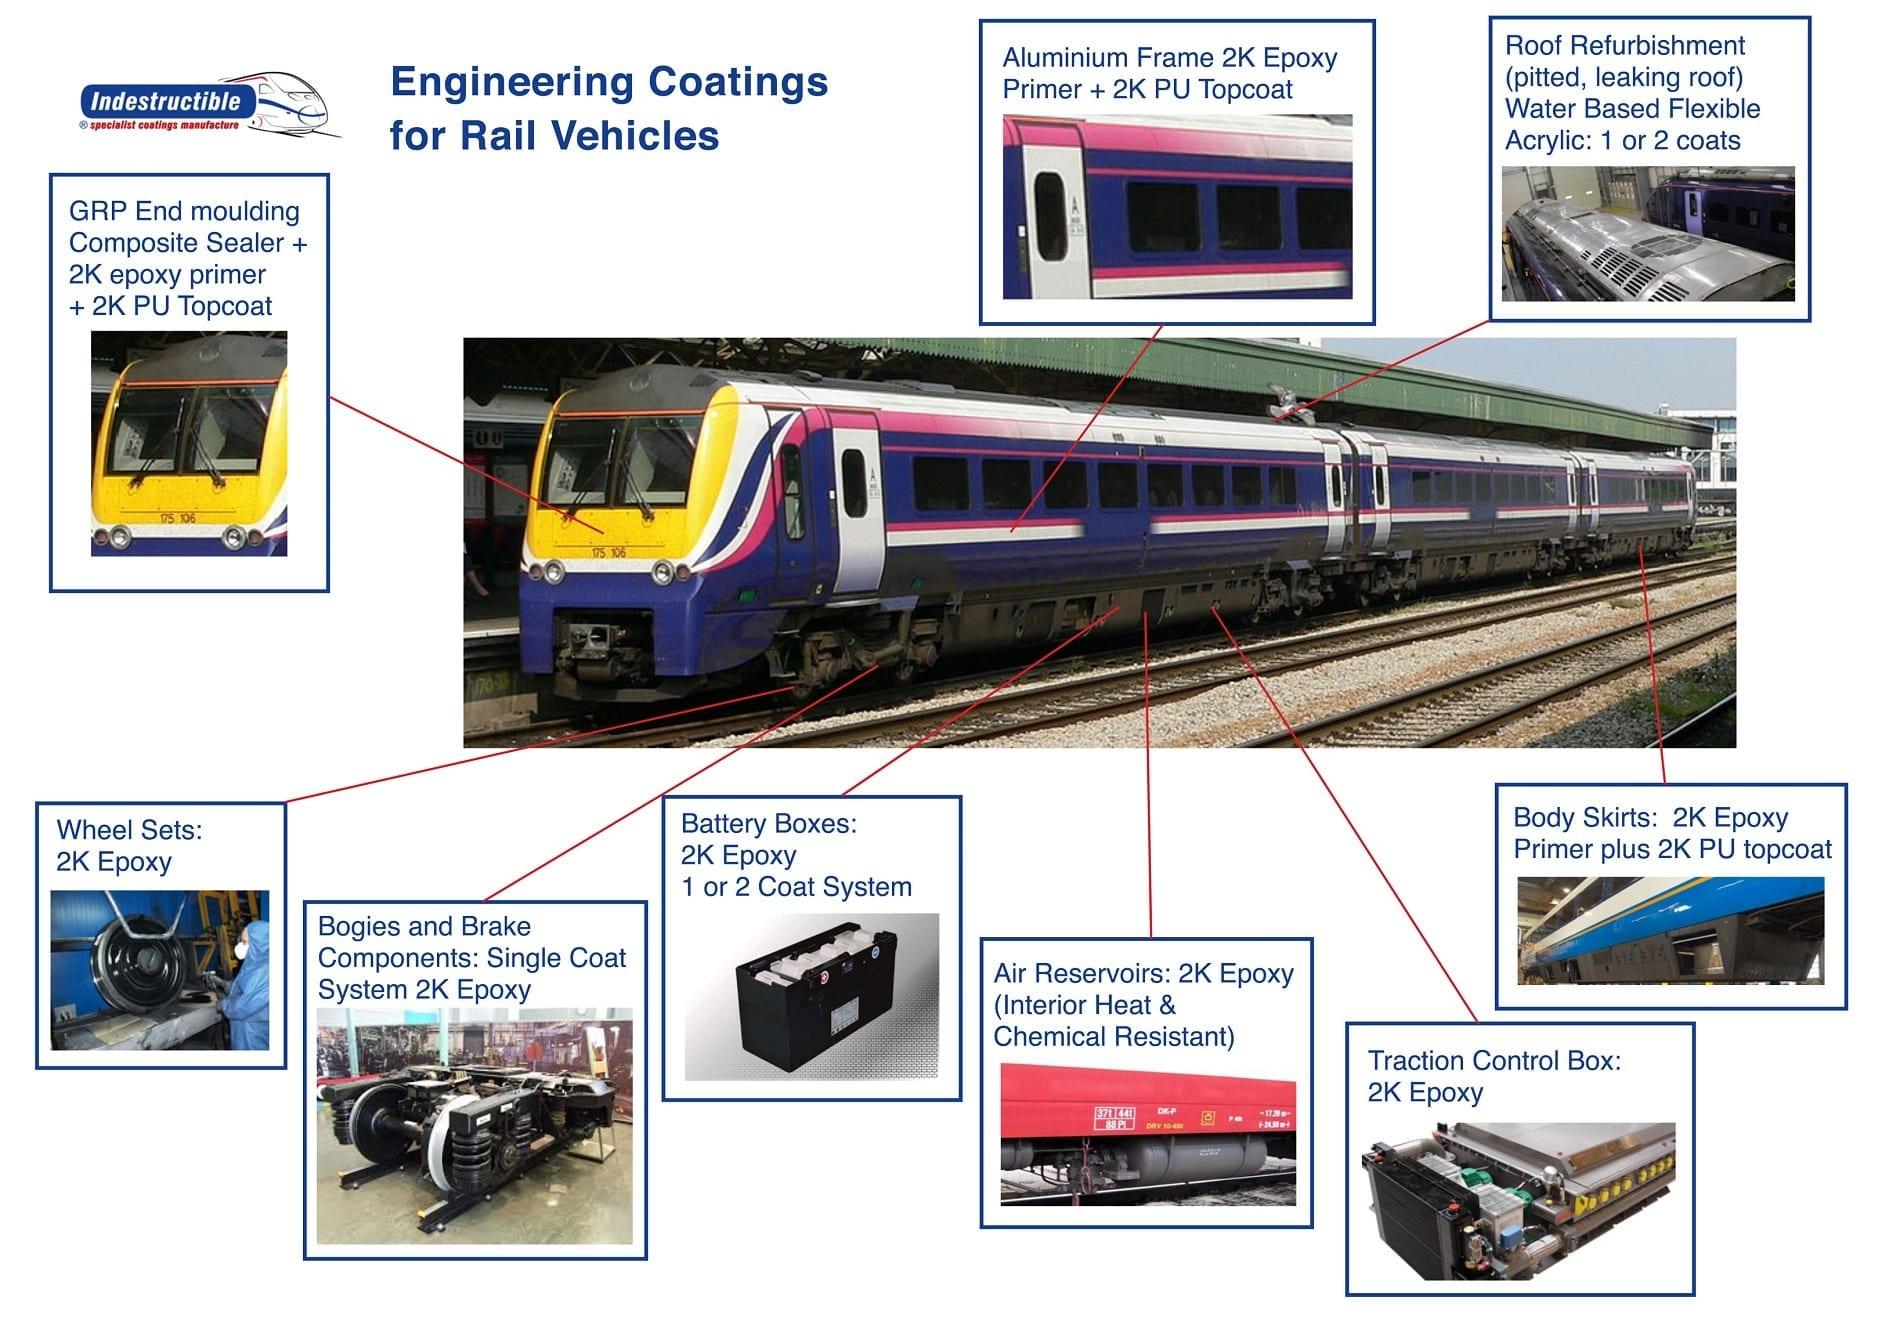 engineering coatings for rail vehicles | industrial coating solutions